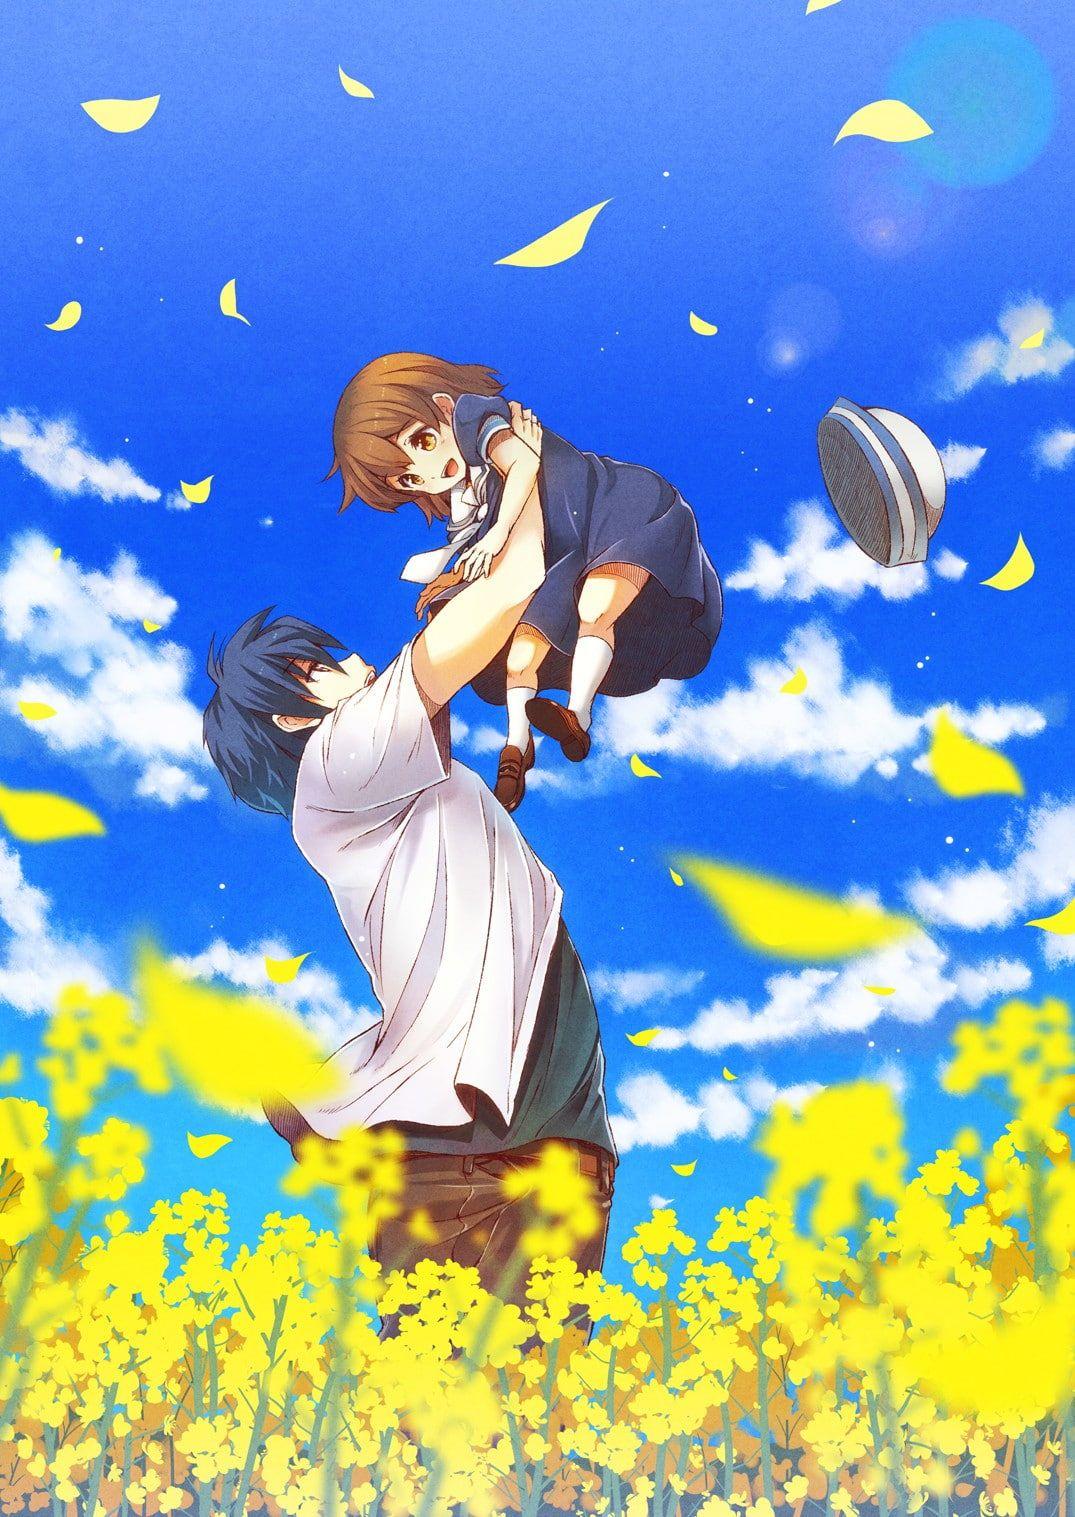 HD wallpaper: Clannad, Tomoya Okazaki, Ushio Okazaki, emotion, young adult